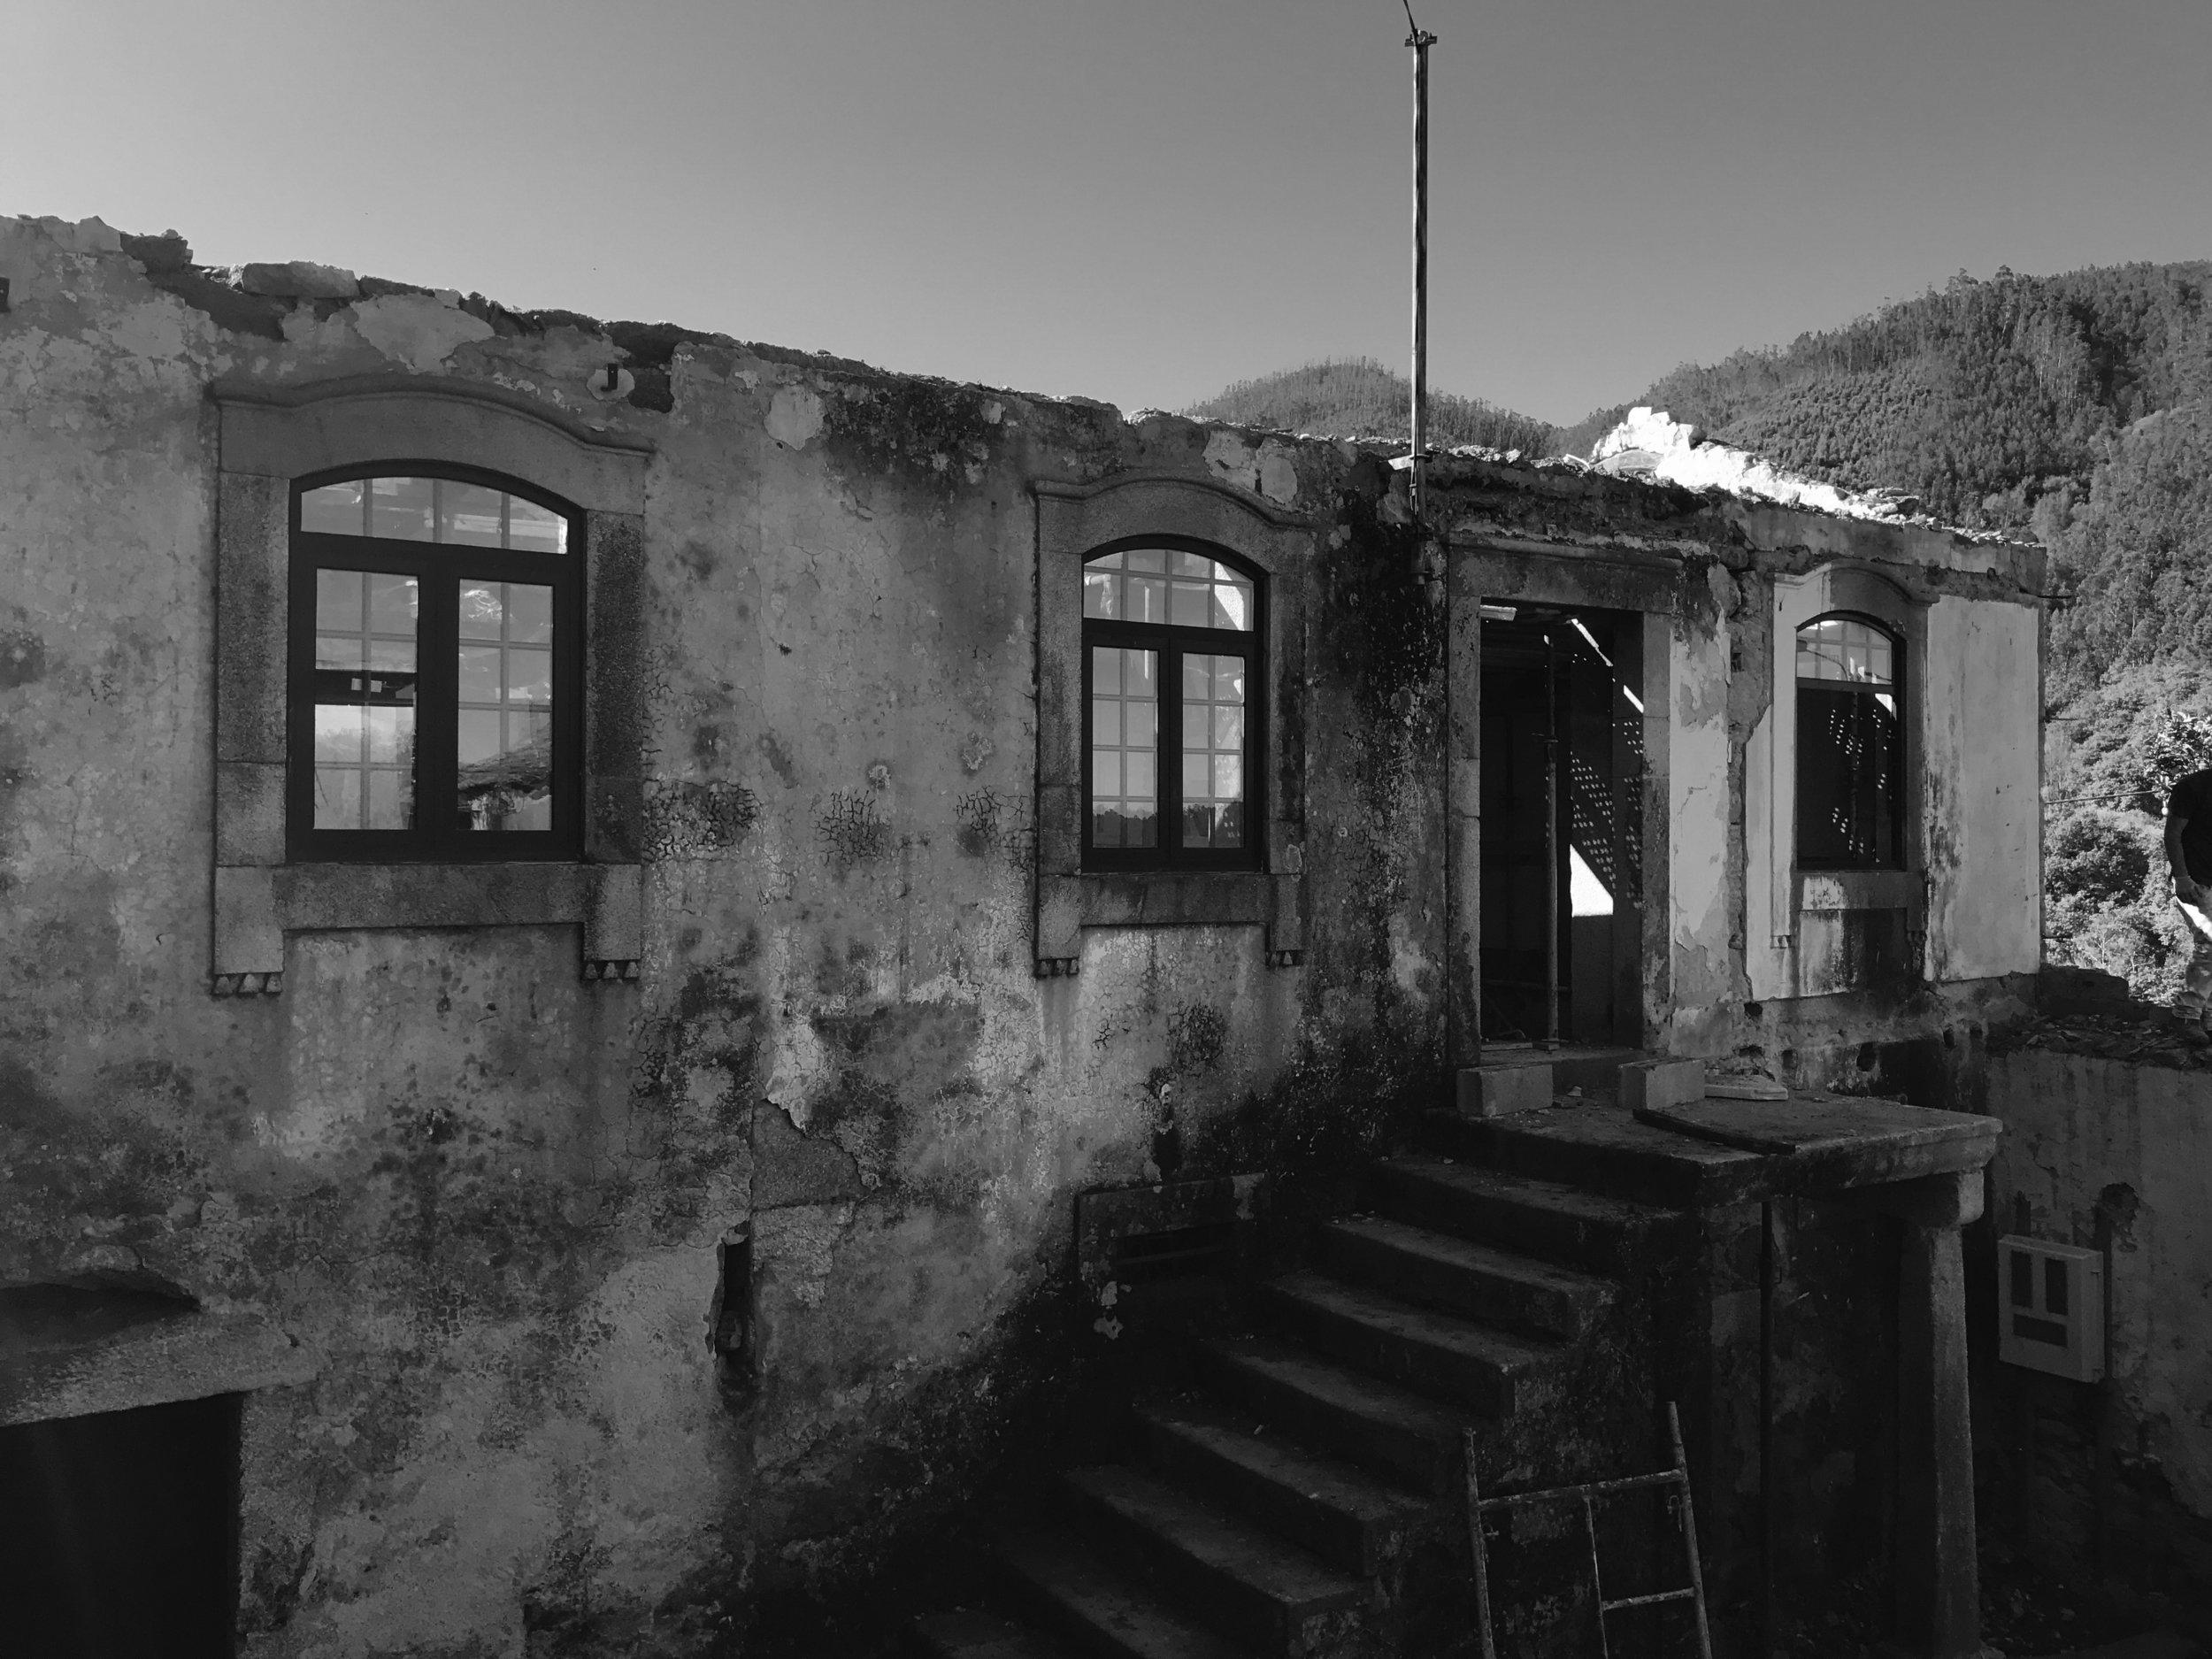 Moradia Folgorosa - Vale de Cambra - EVA atelier - Arquitectura - Obra - Arquitecto - Porto - EVA evolutionary architecture (16).jpg